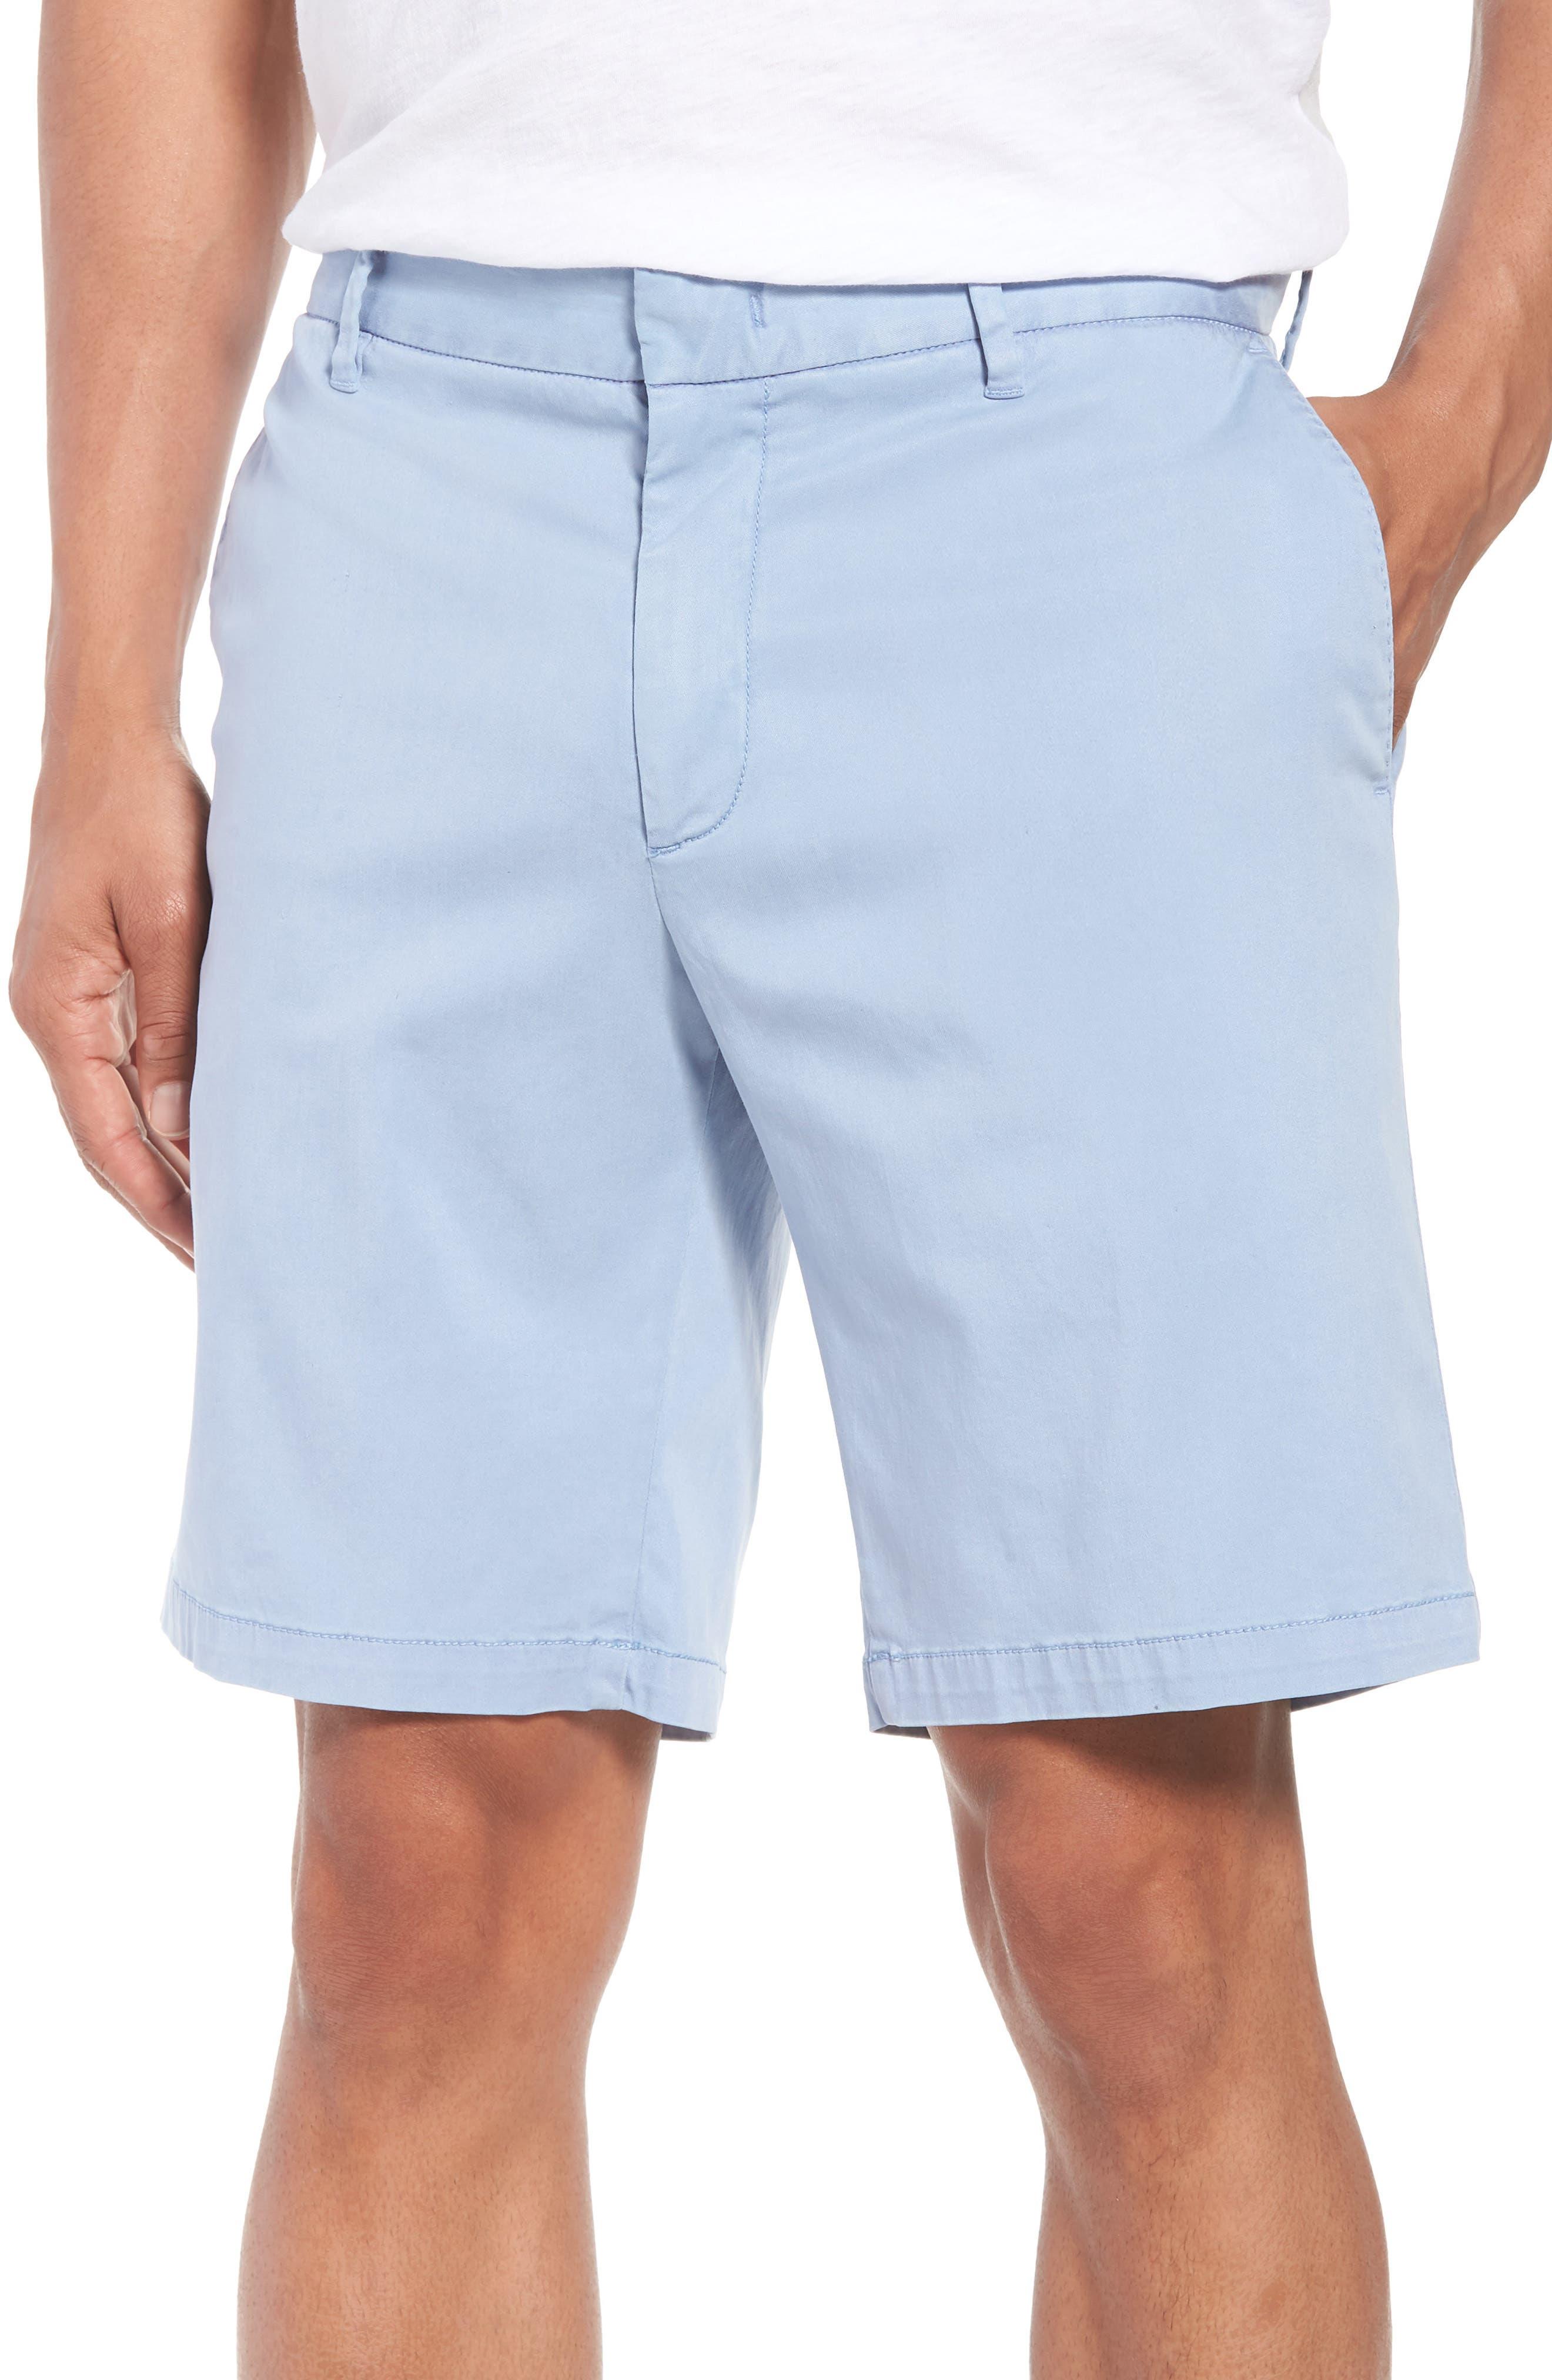 ZACHARY PRELL Catalpa Chino Shorts in Azure